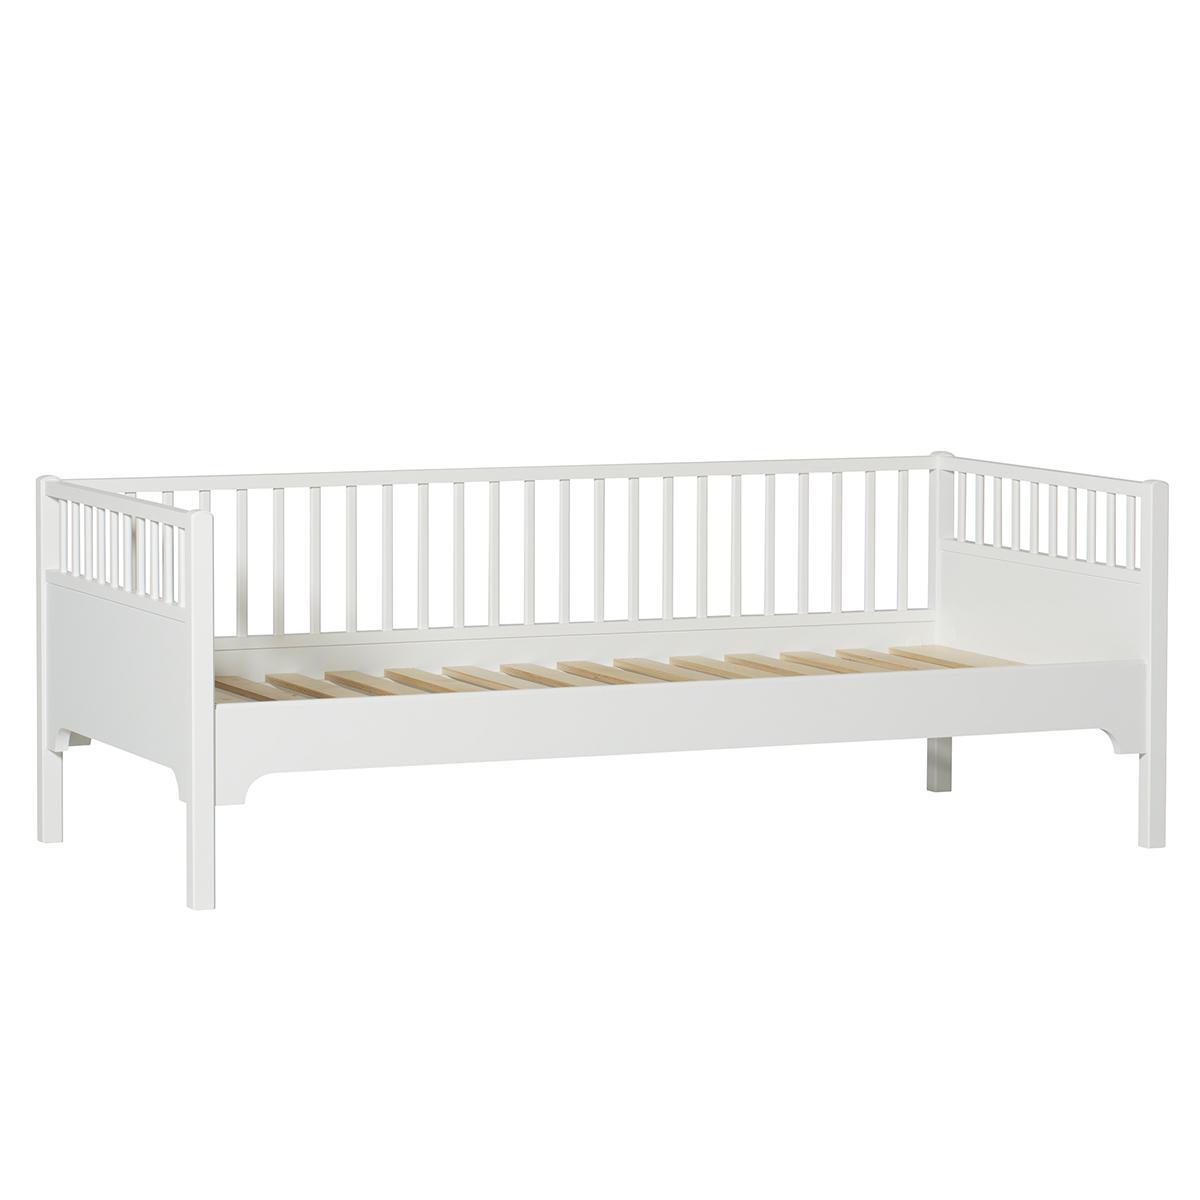 Tagesbett 90x200cm SEASIDE Oliver Furniture weiß